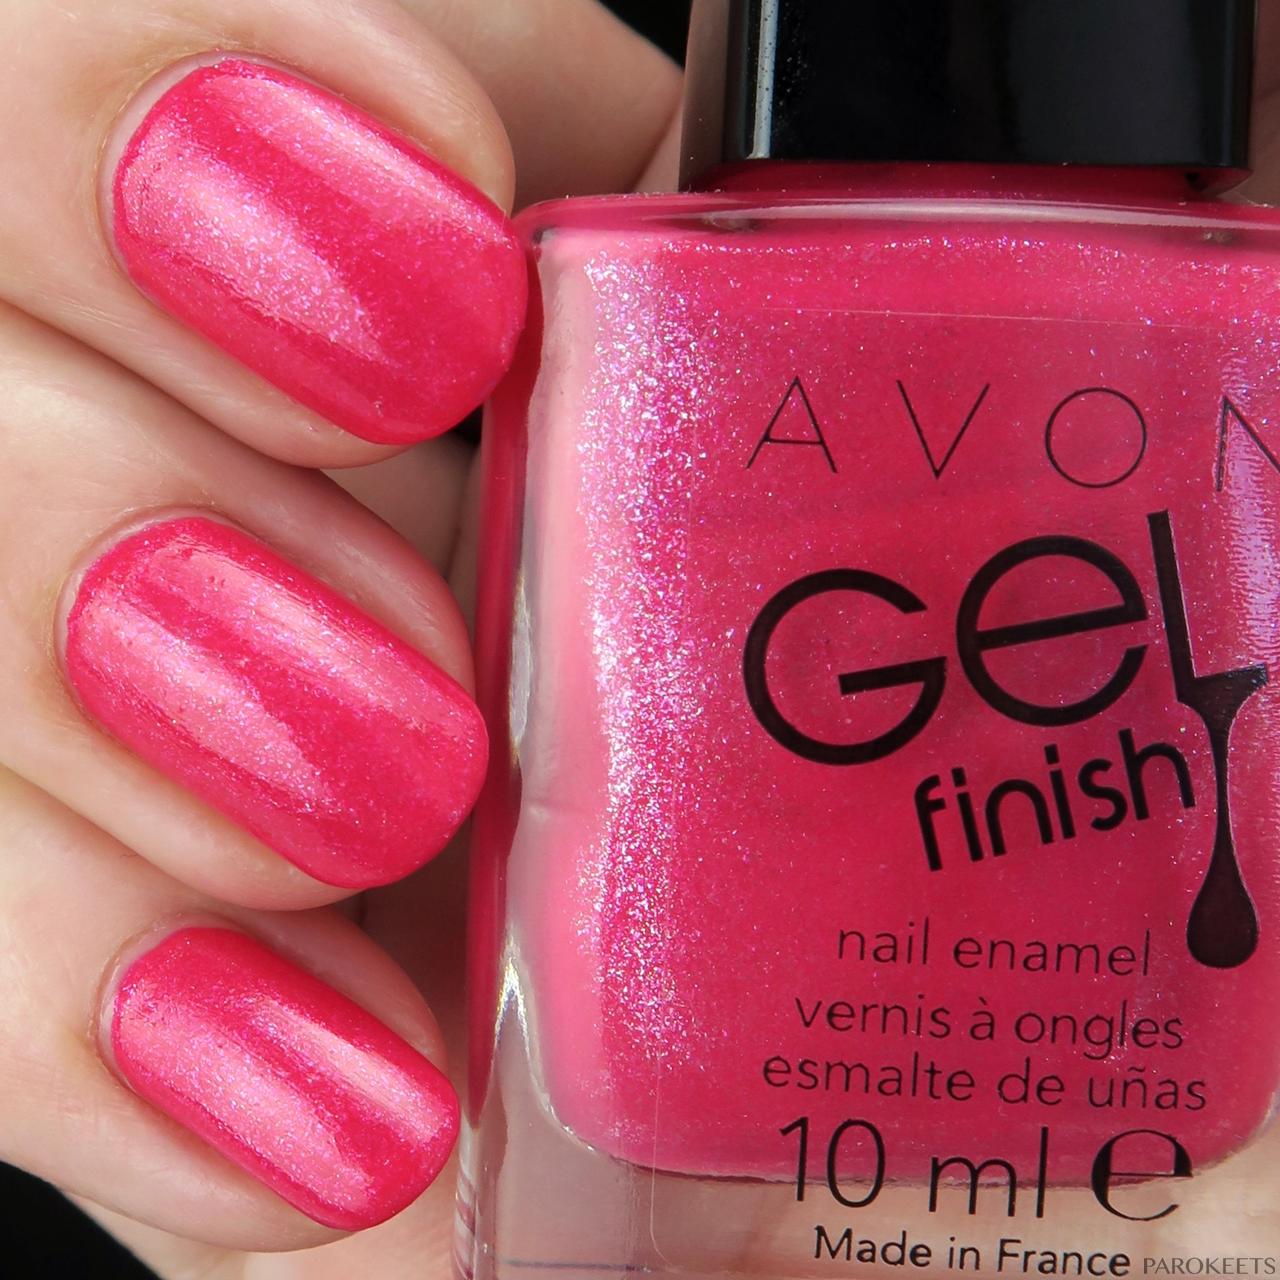 Avon Gel Finish Nail Polishes New 2016 Parokeets